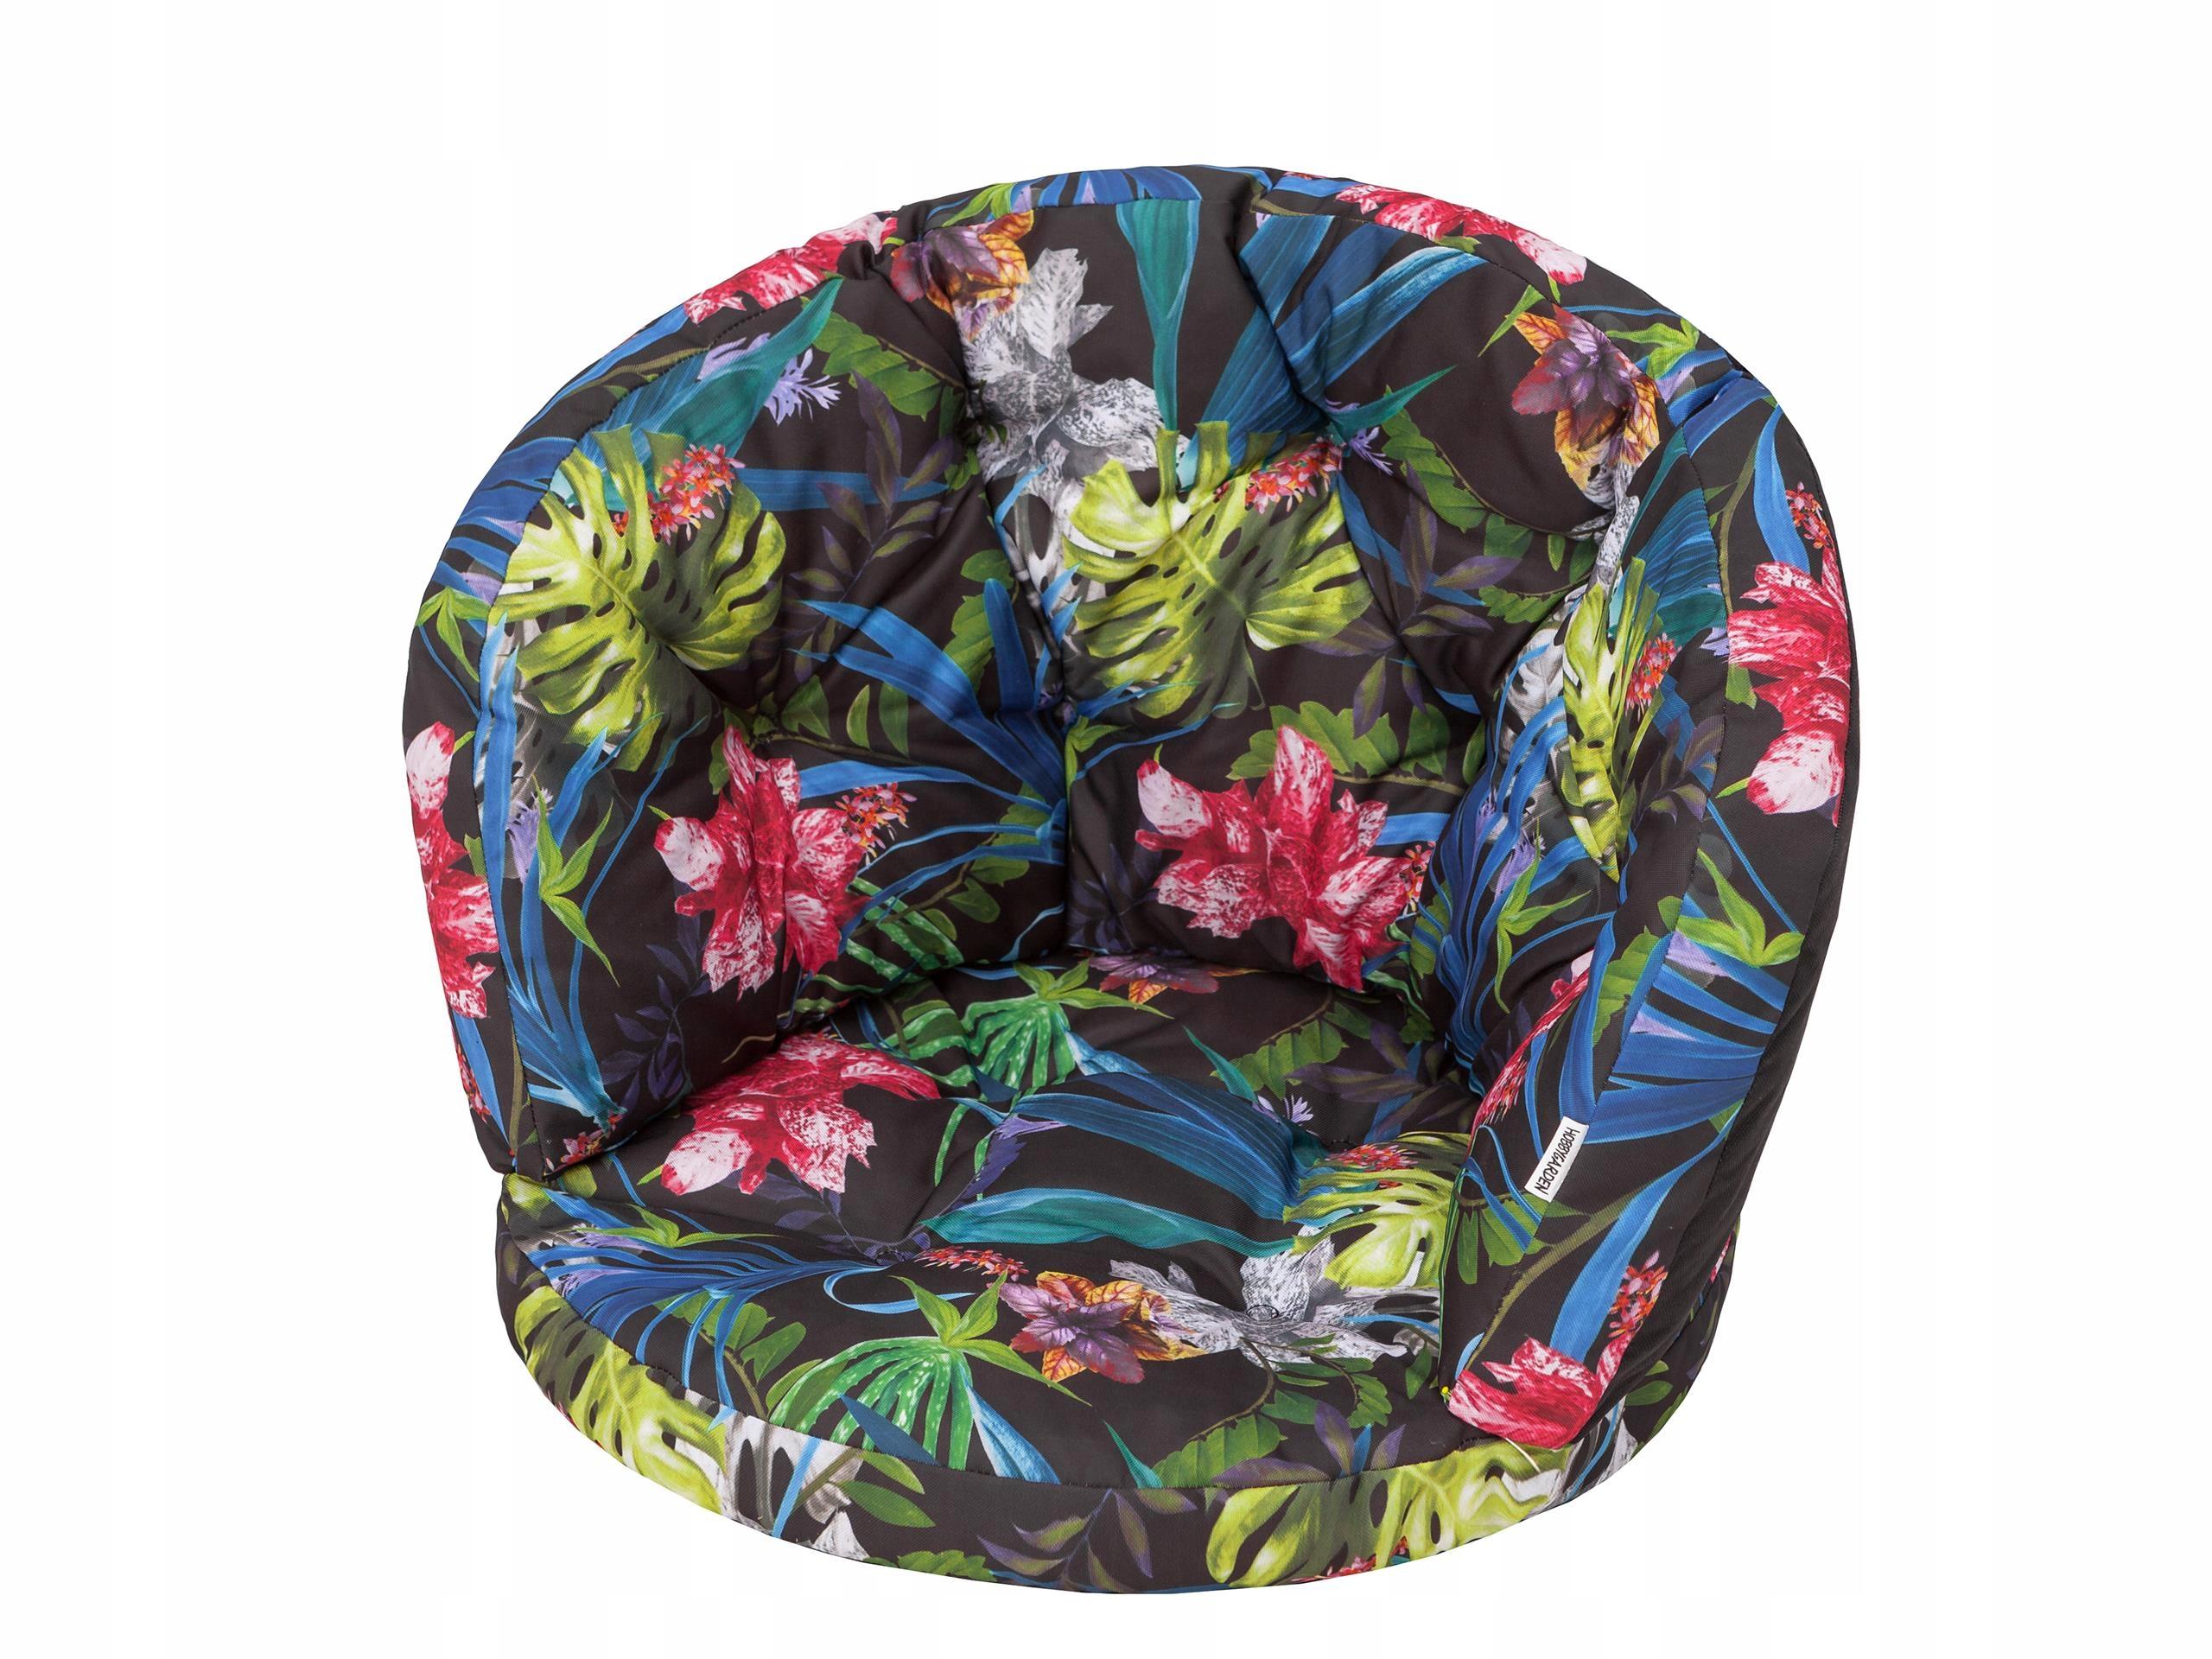 Кресло Подушка Wicker Rattan Chair 50x50